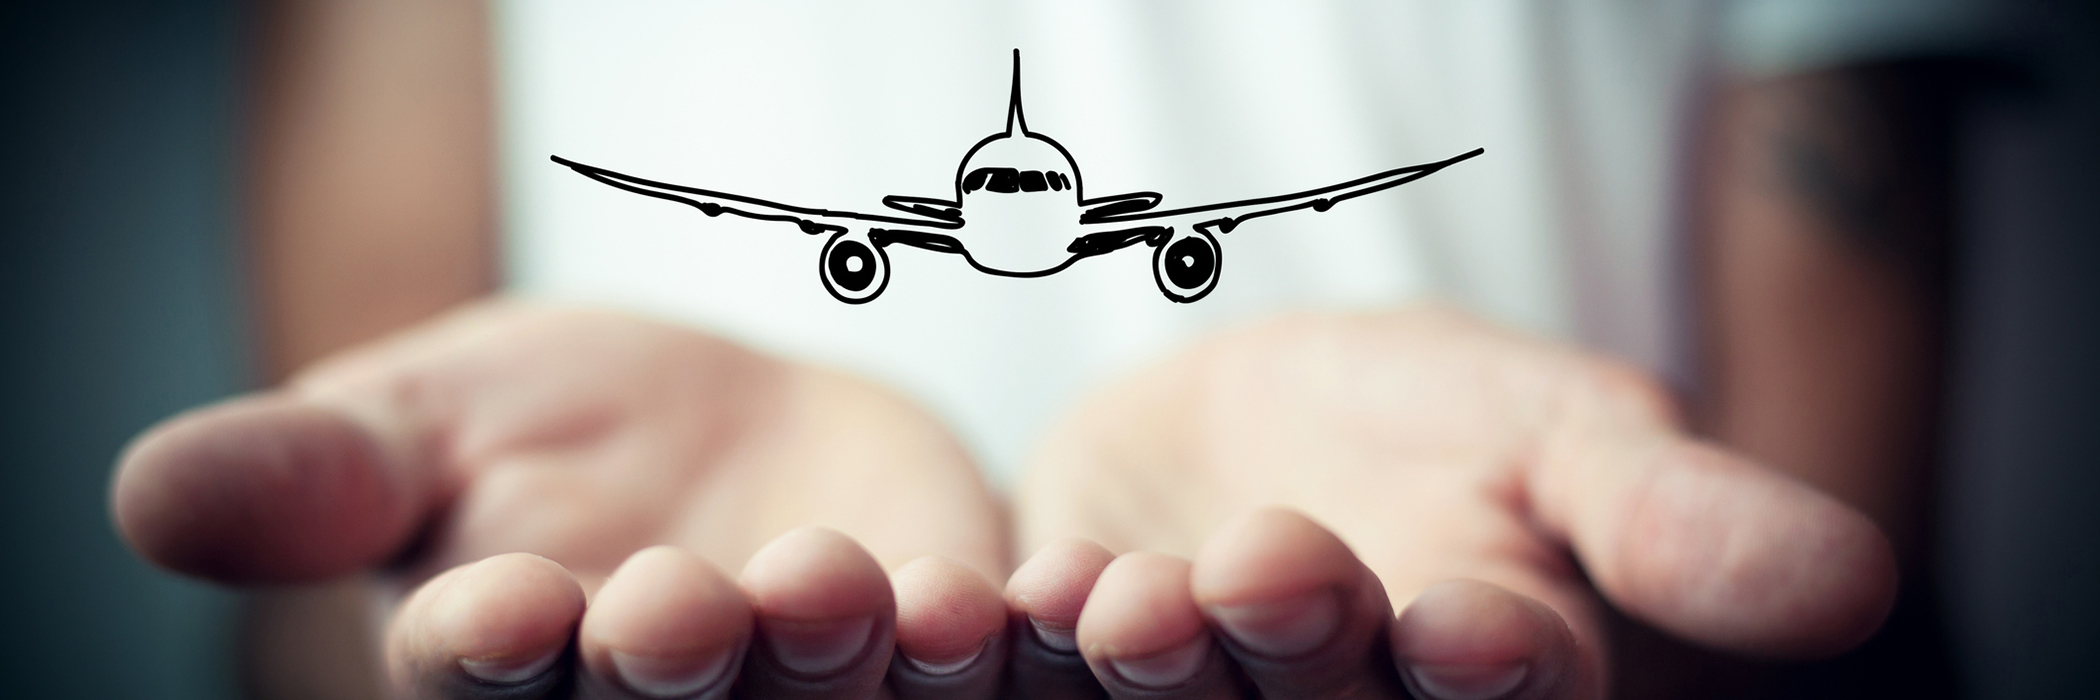 airplane nestled inside hands